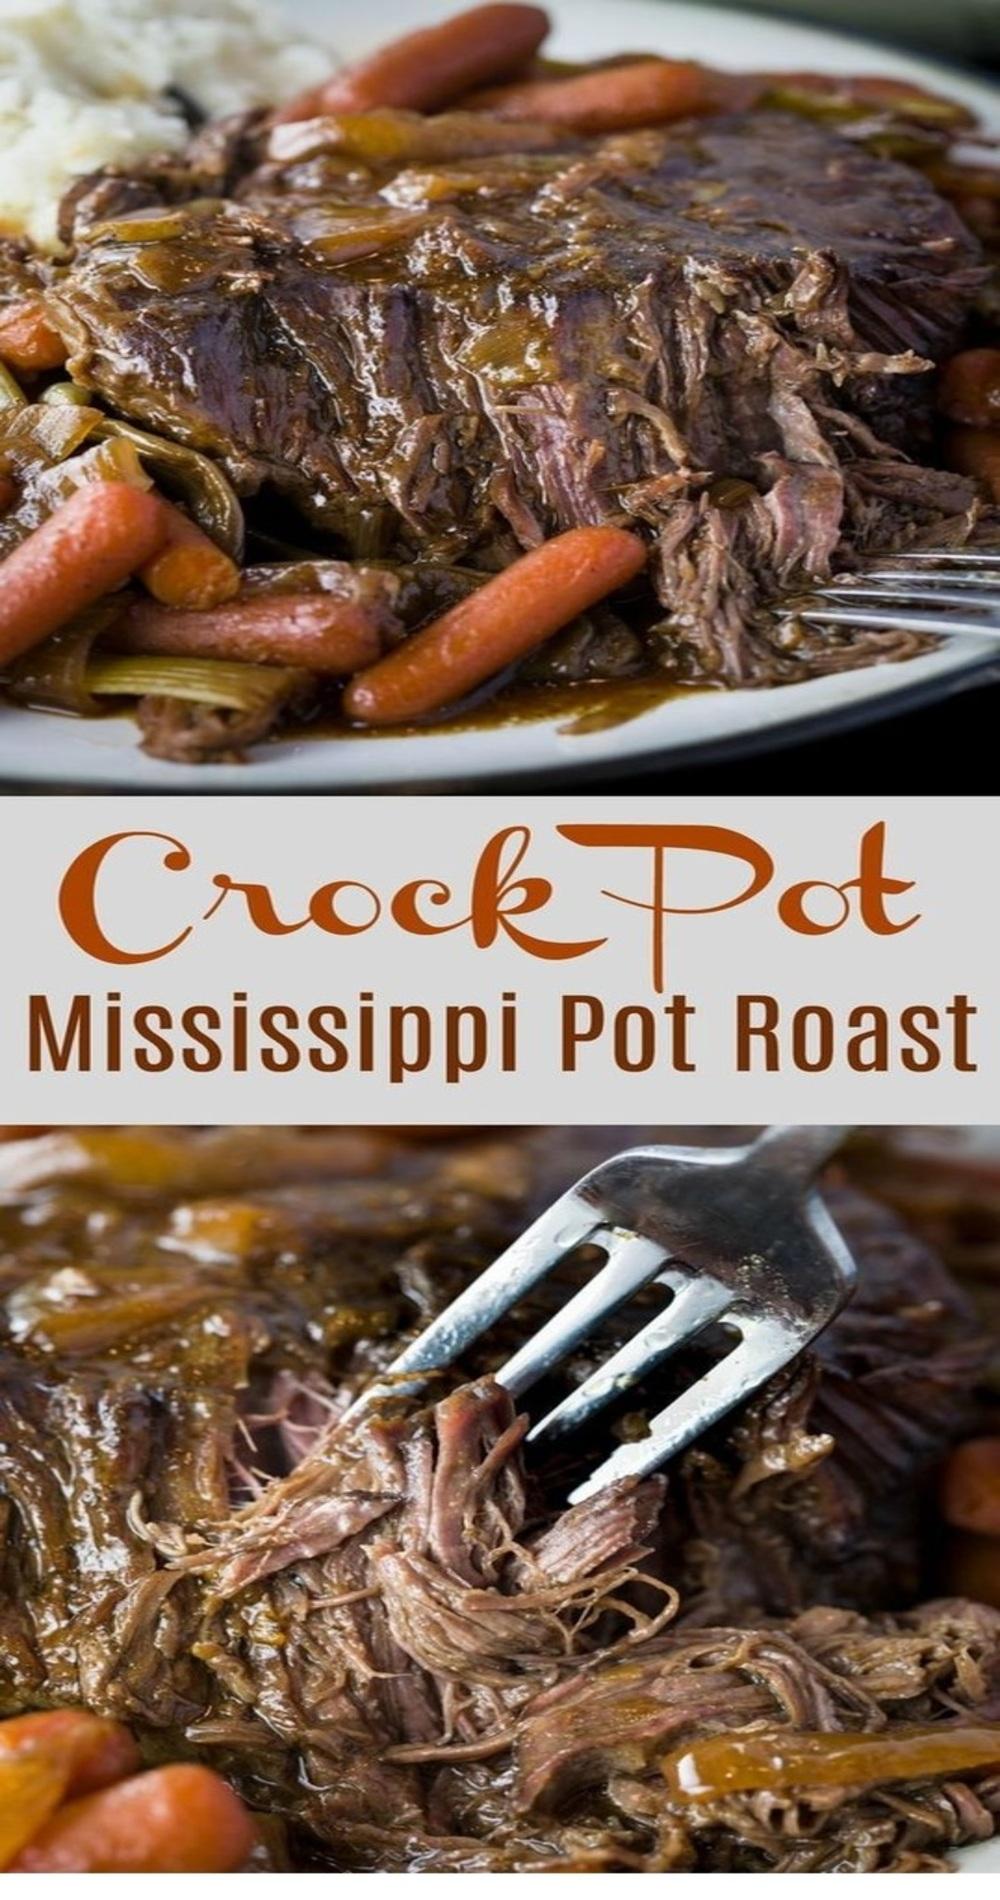 Crock Pot Mississippi Pot Roast